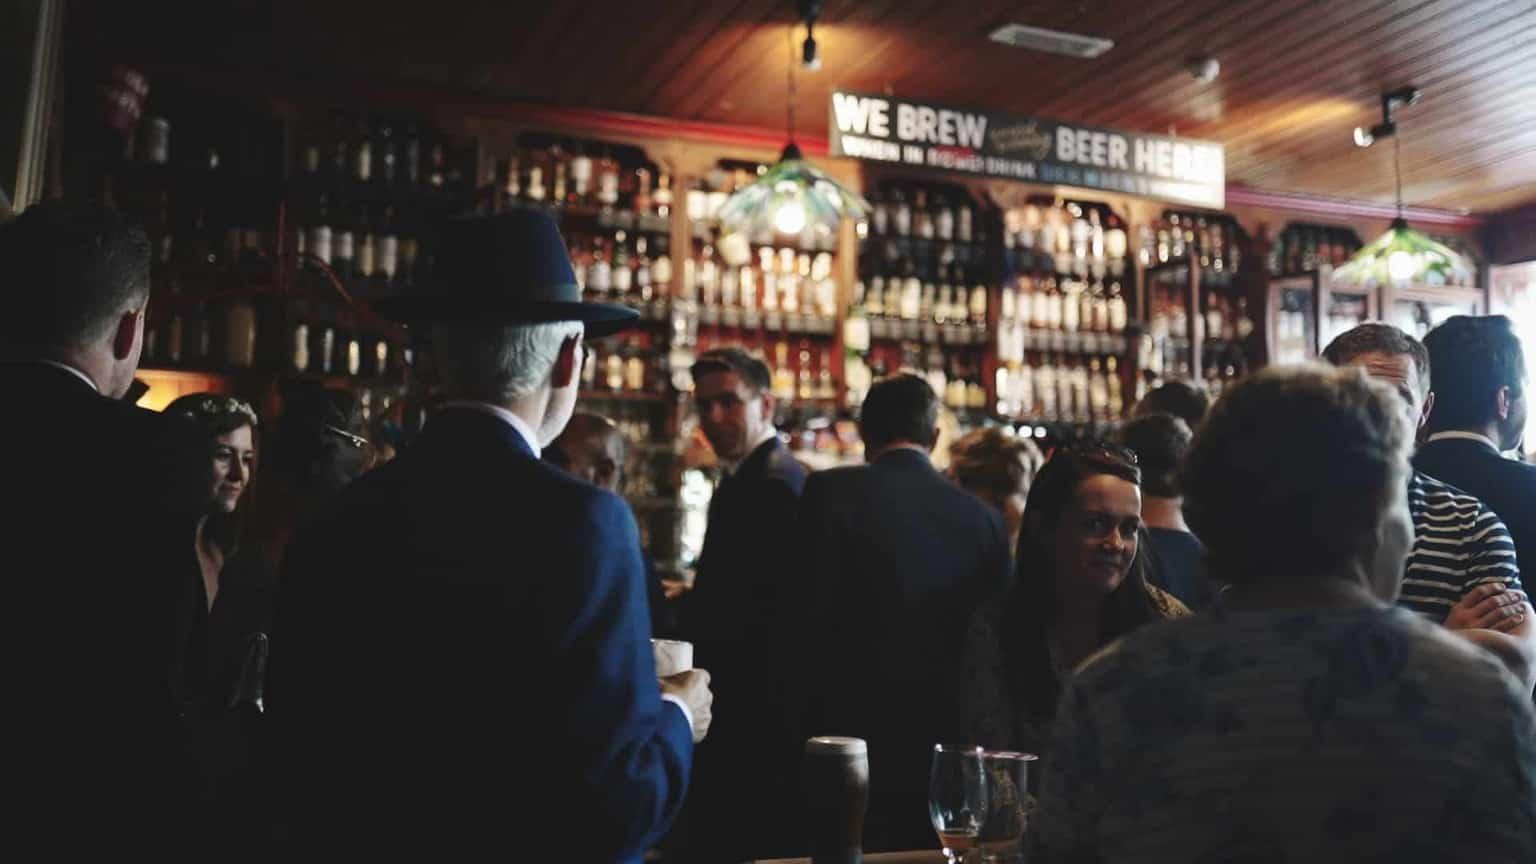 Dick Macks interior look at bar